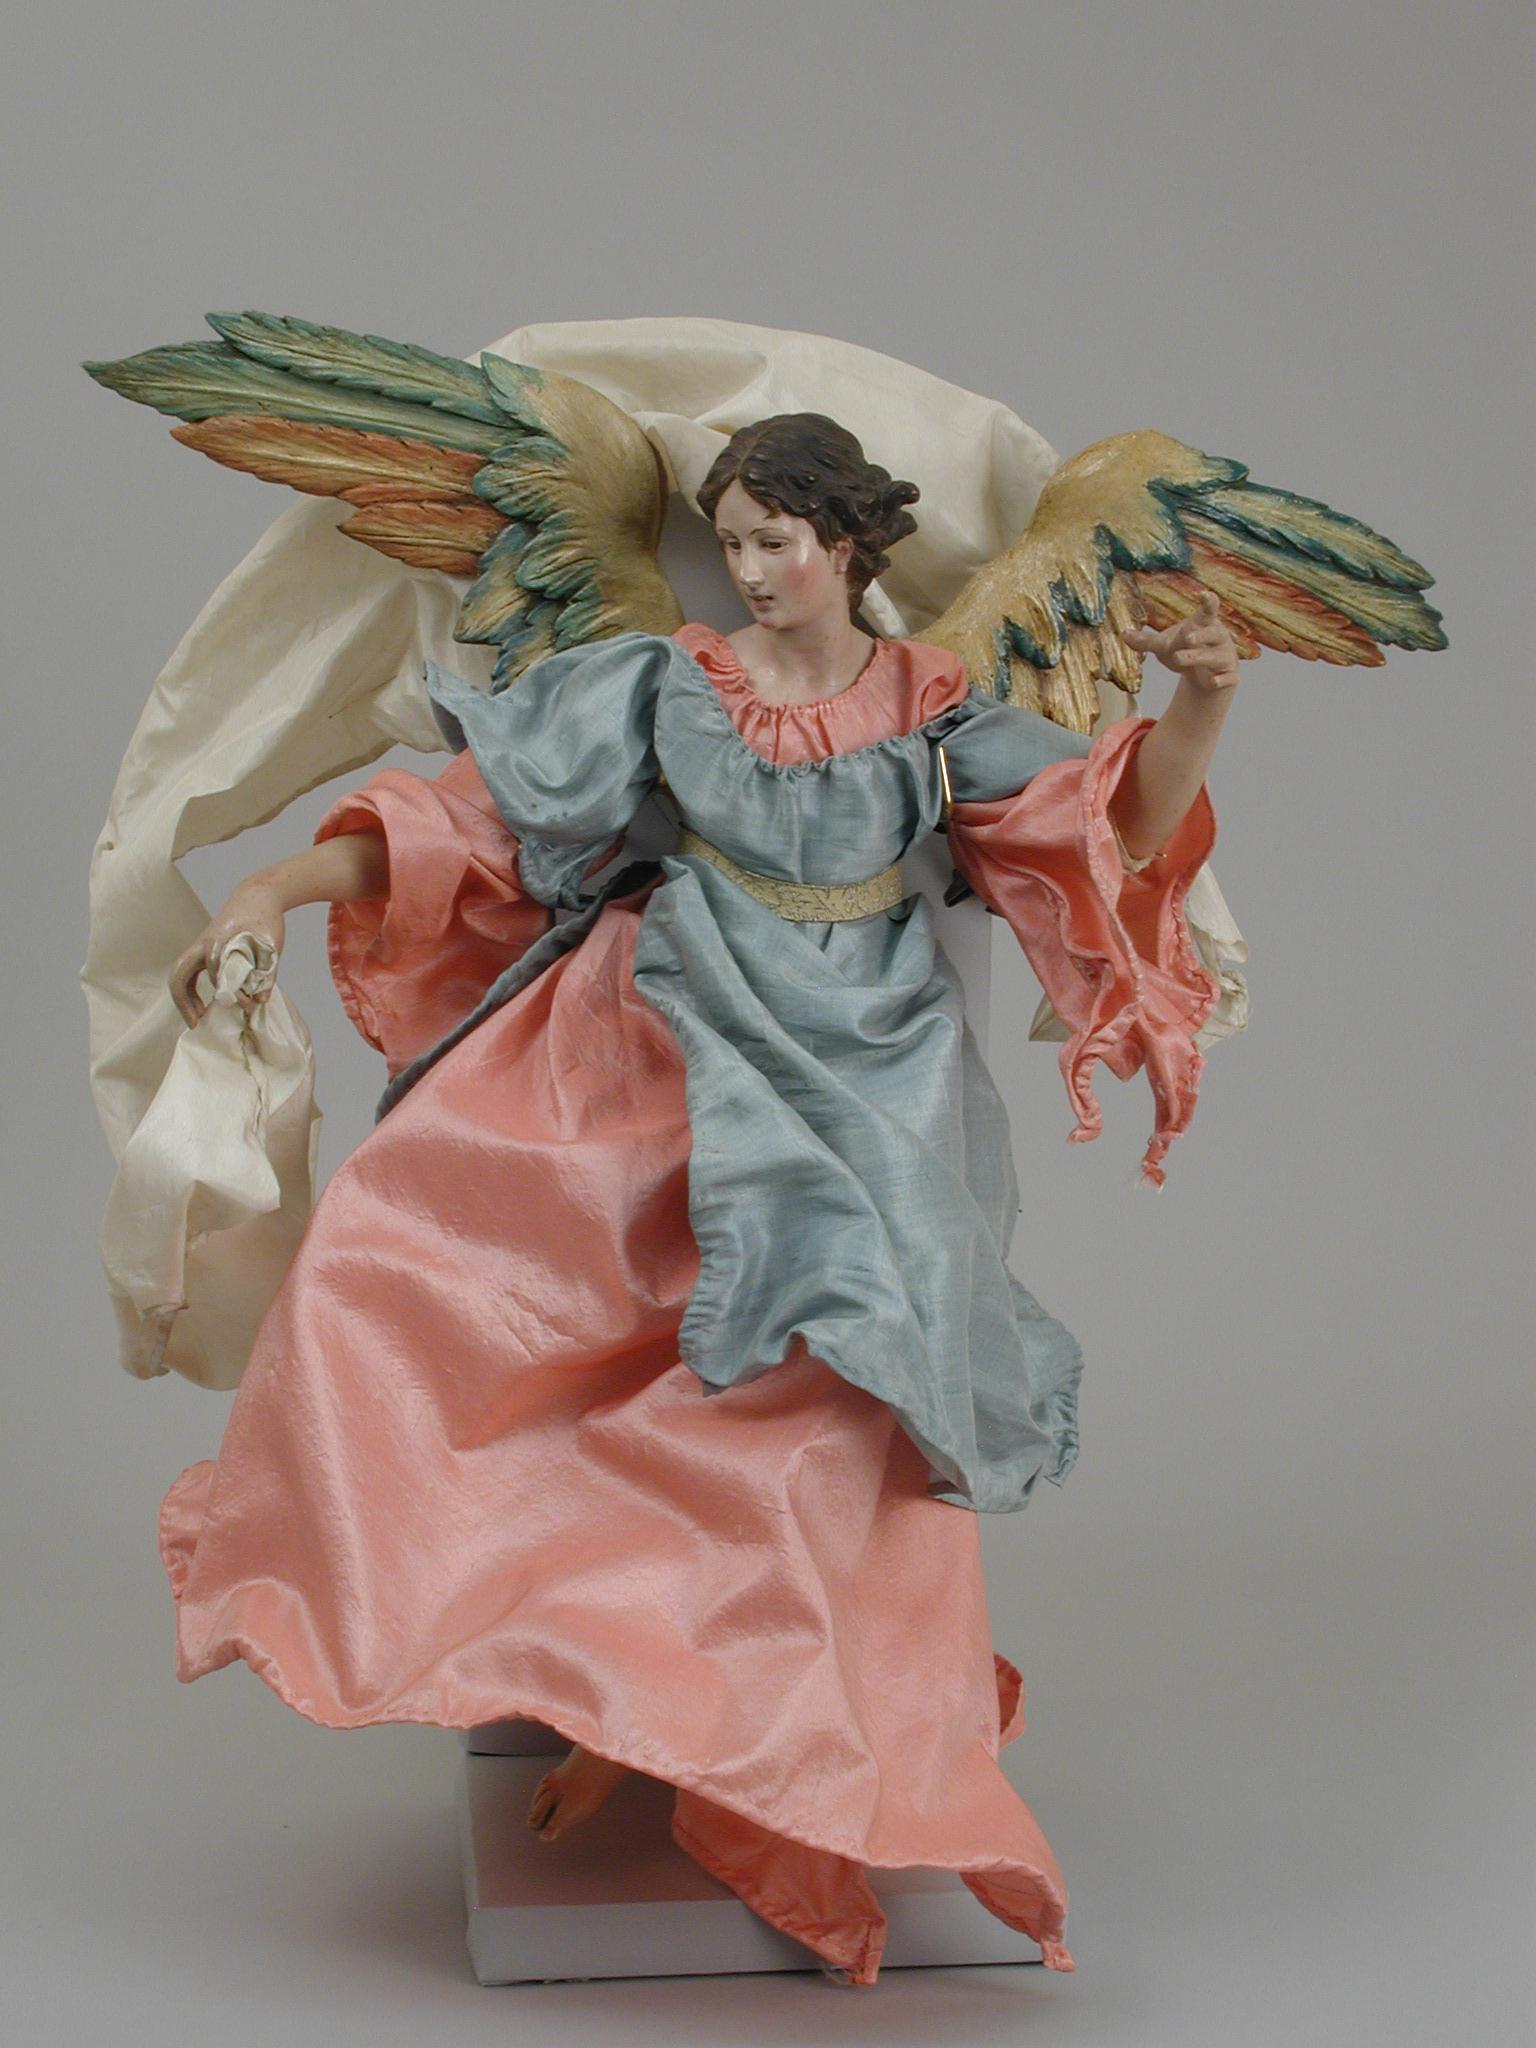 https://images.metmuseum.org/CRDImages/es/original/LC-64_164_17.jpg